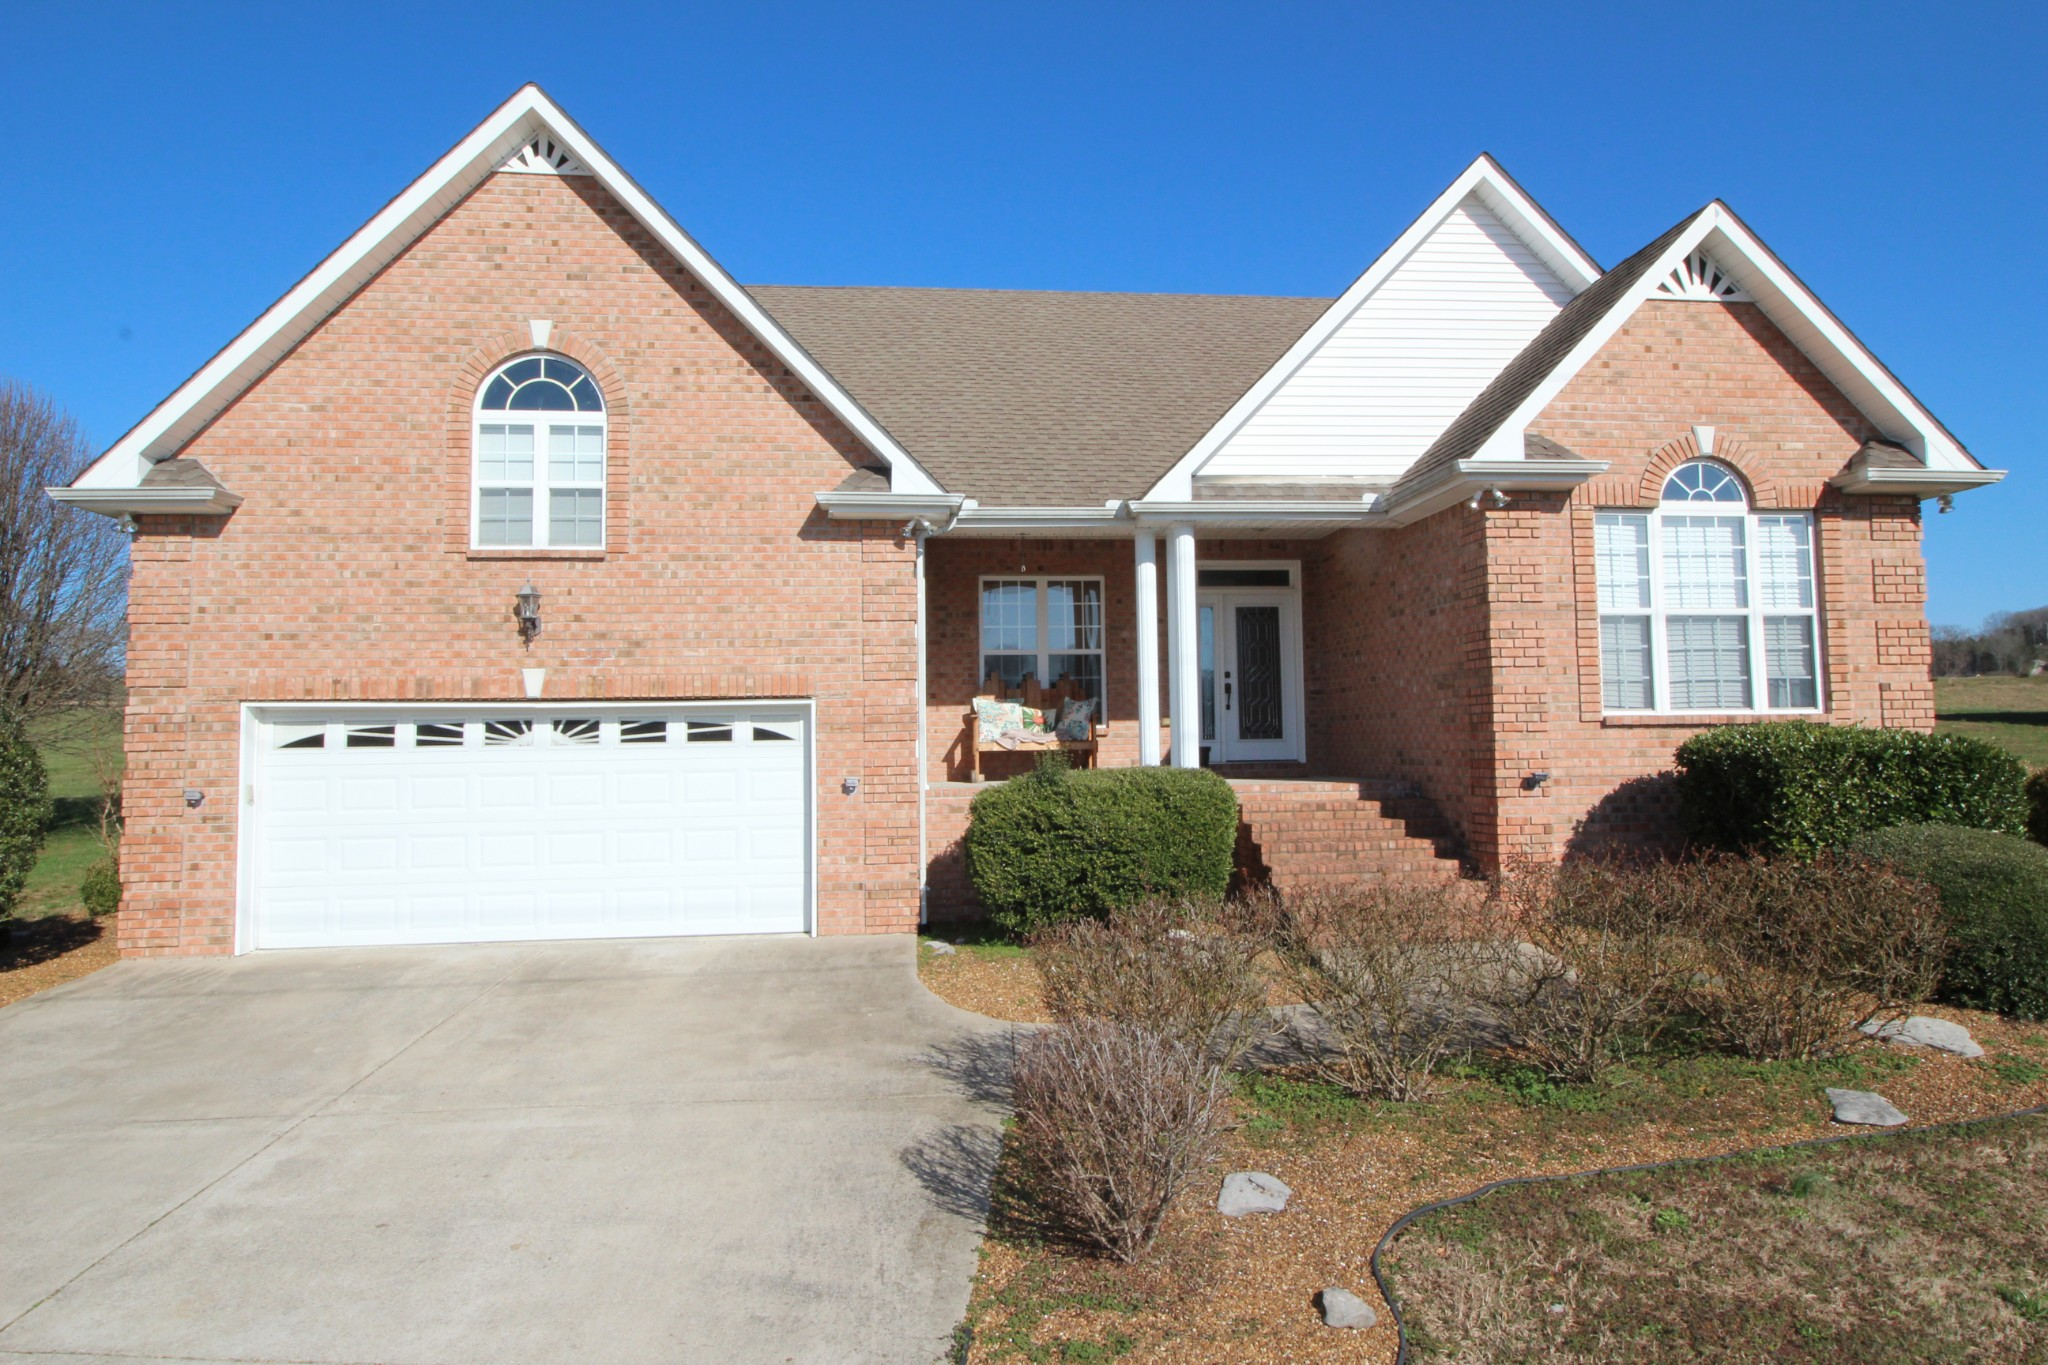 3215 Highway 141, N, Hartsville, TN 37074 - Hartsville, TN real estate listing